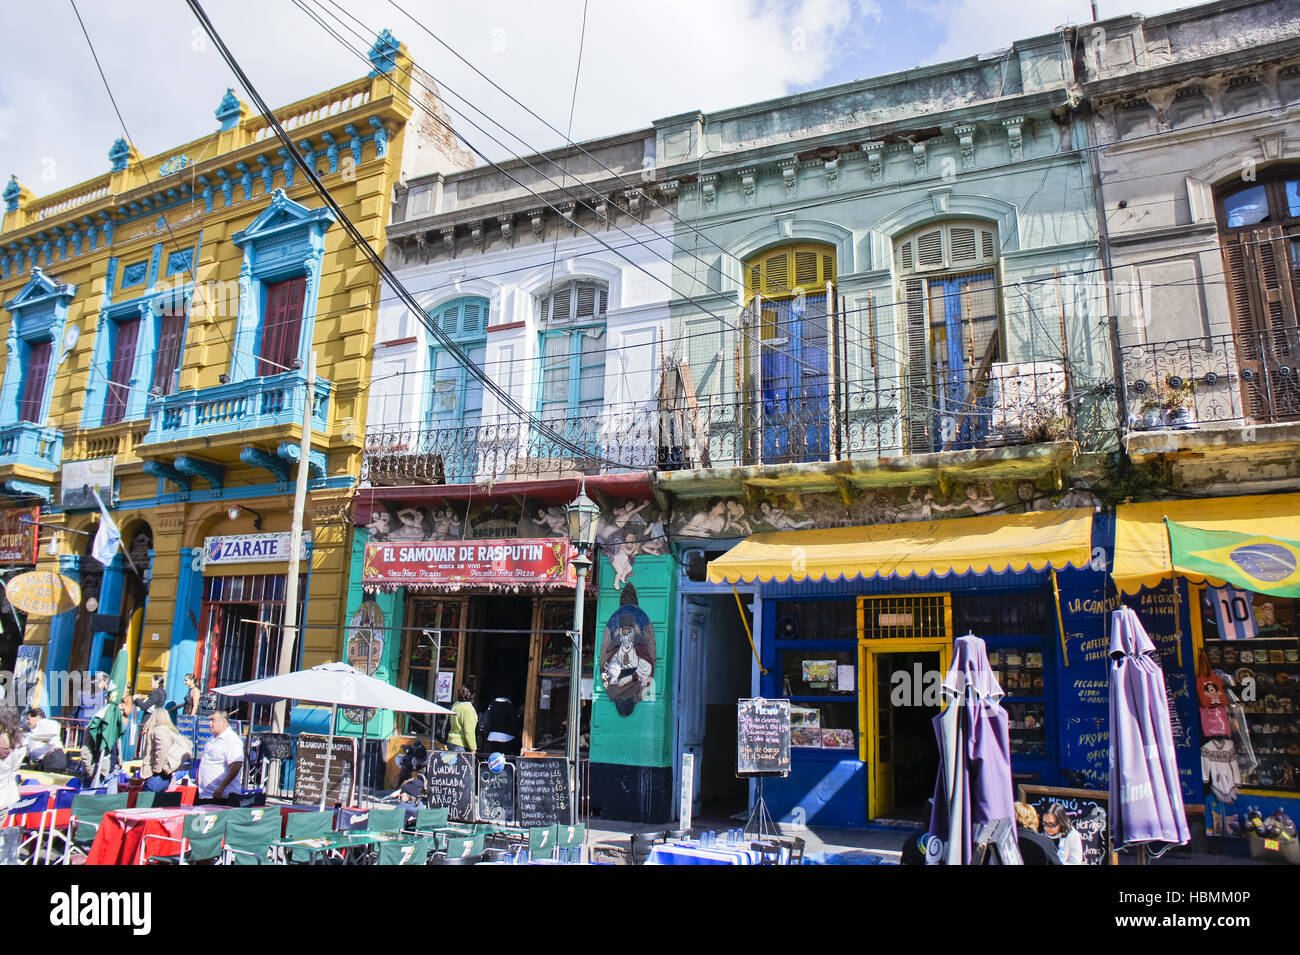 Argentina, Buenos Aires, La Boca, caminito - Stock Image